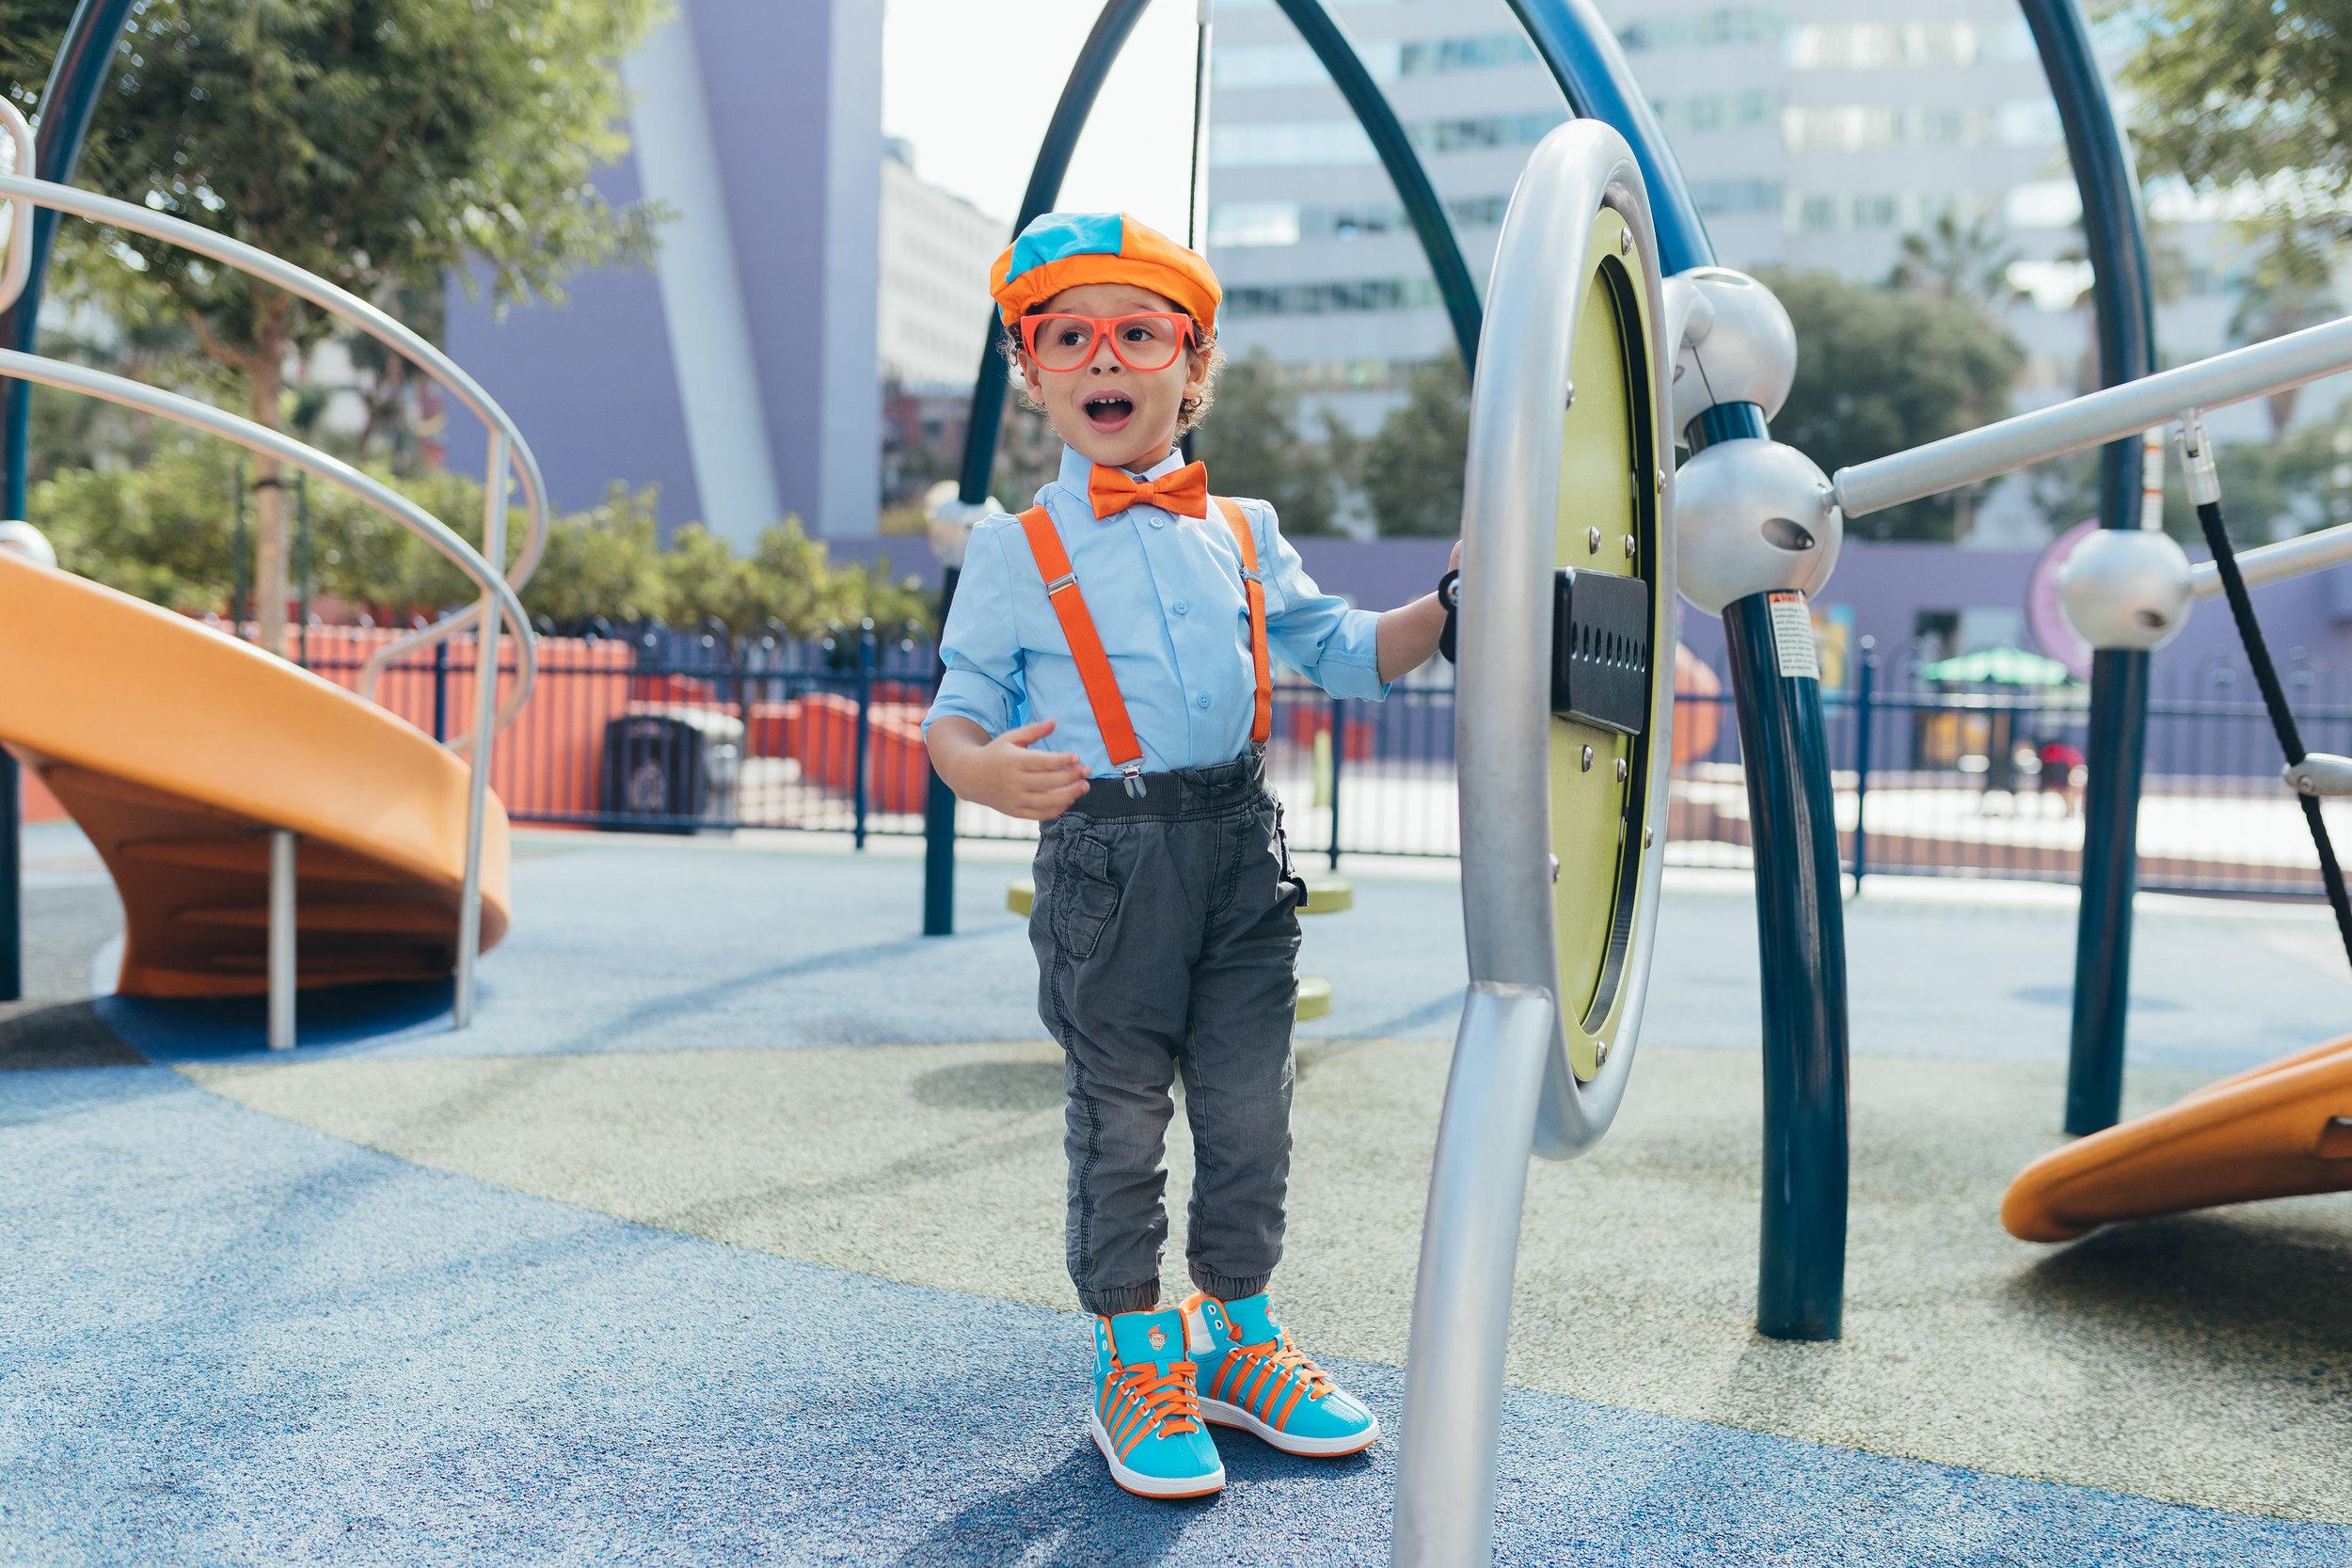 kswiss-blippi-lifestyle-outdoors-kids-web-1.jpg